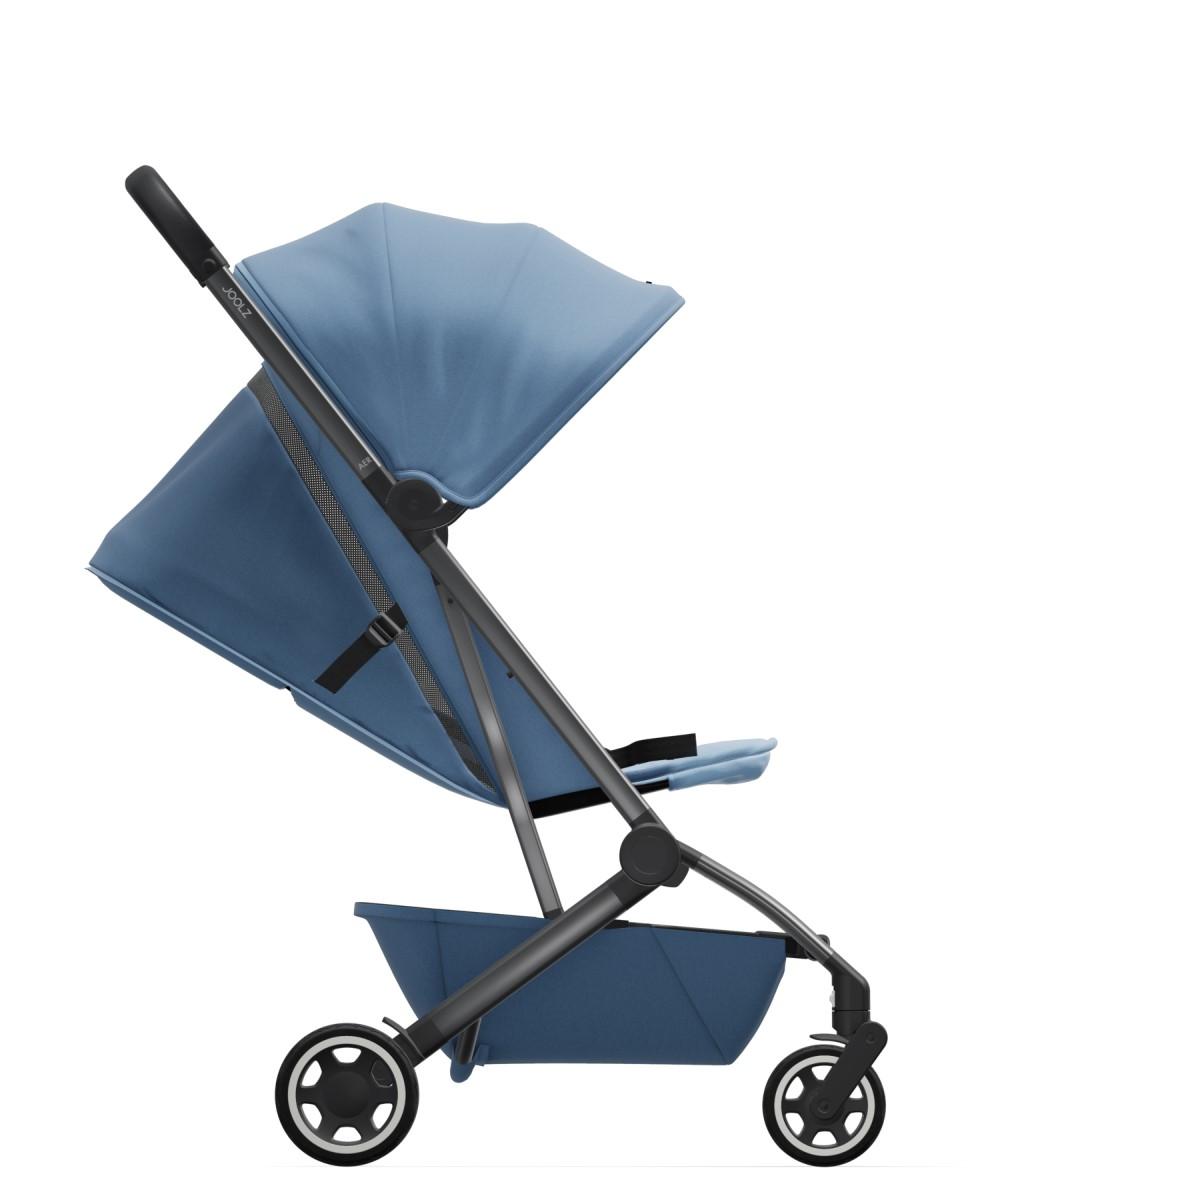 96232-SILLA PASEO JOOLZ AER SPLENDID BLUE(0-0)-1